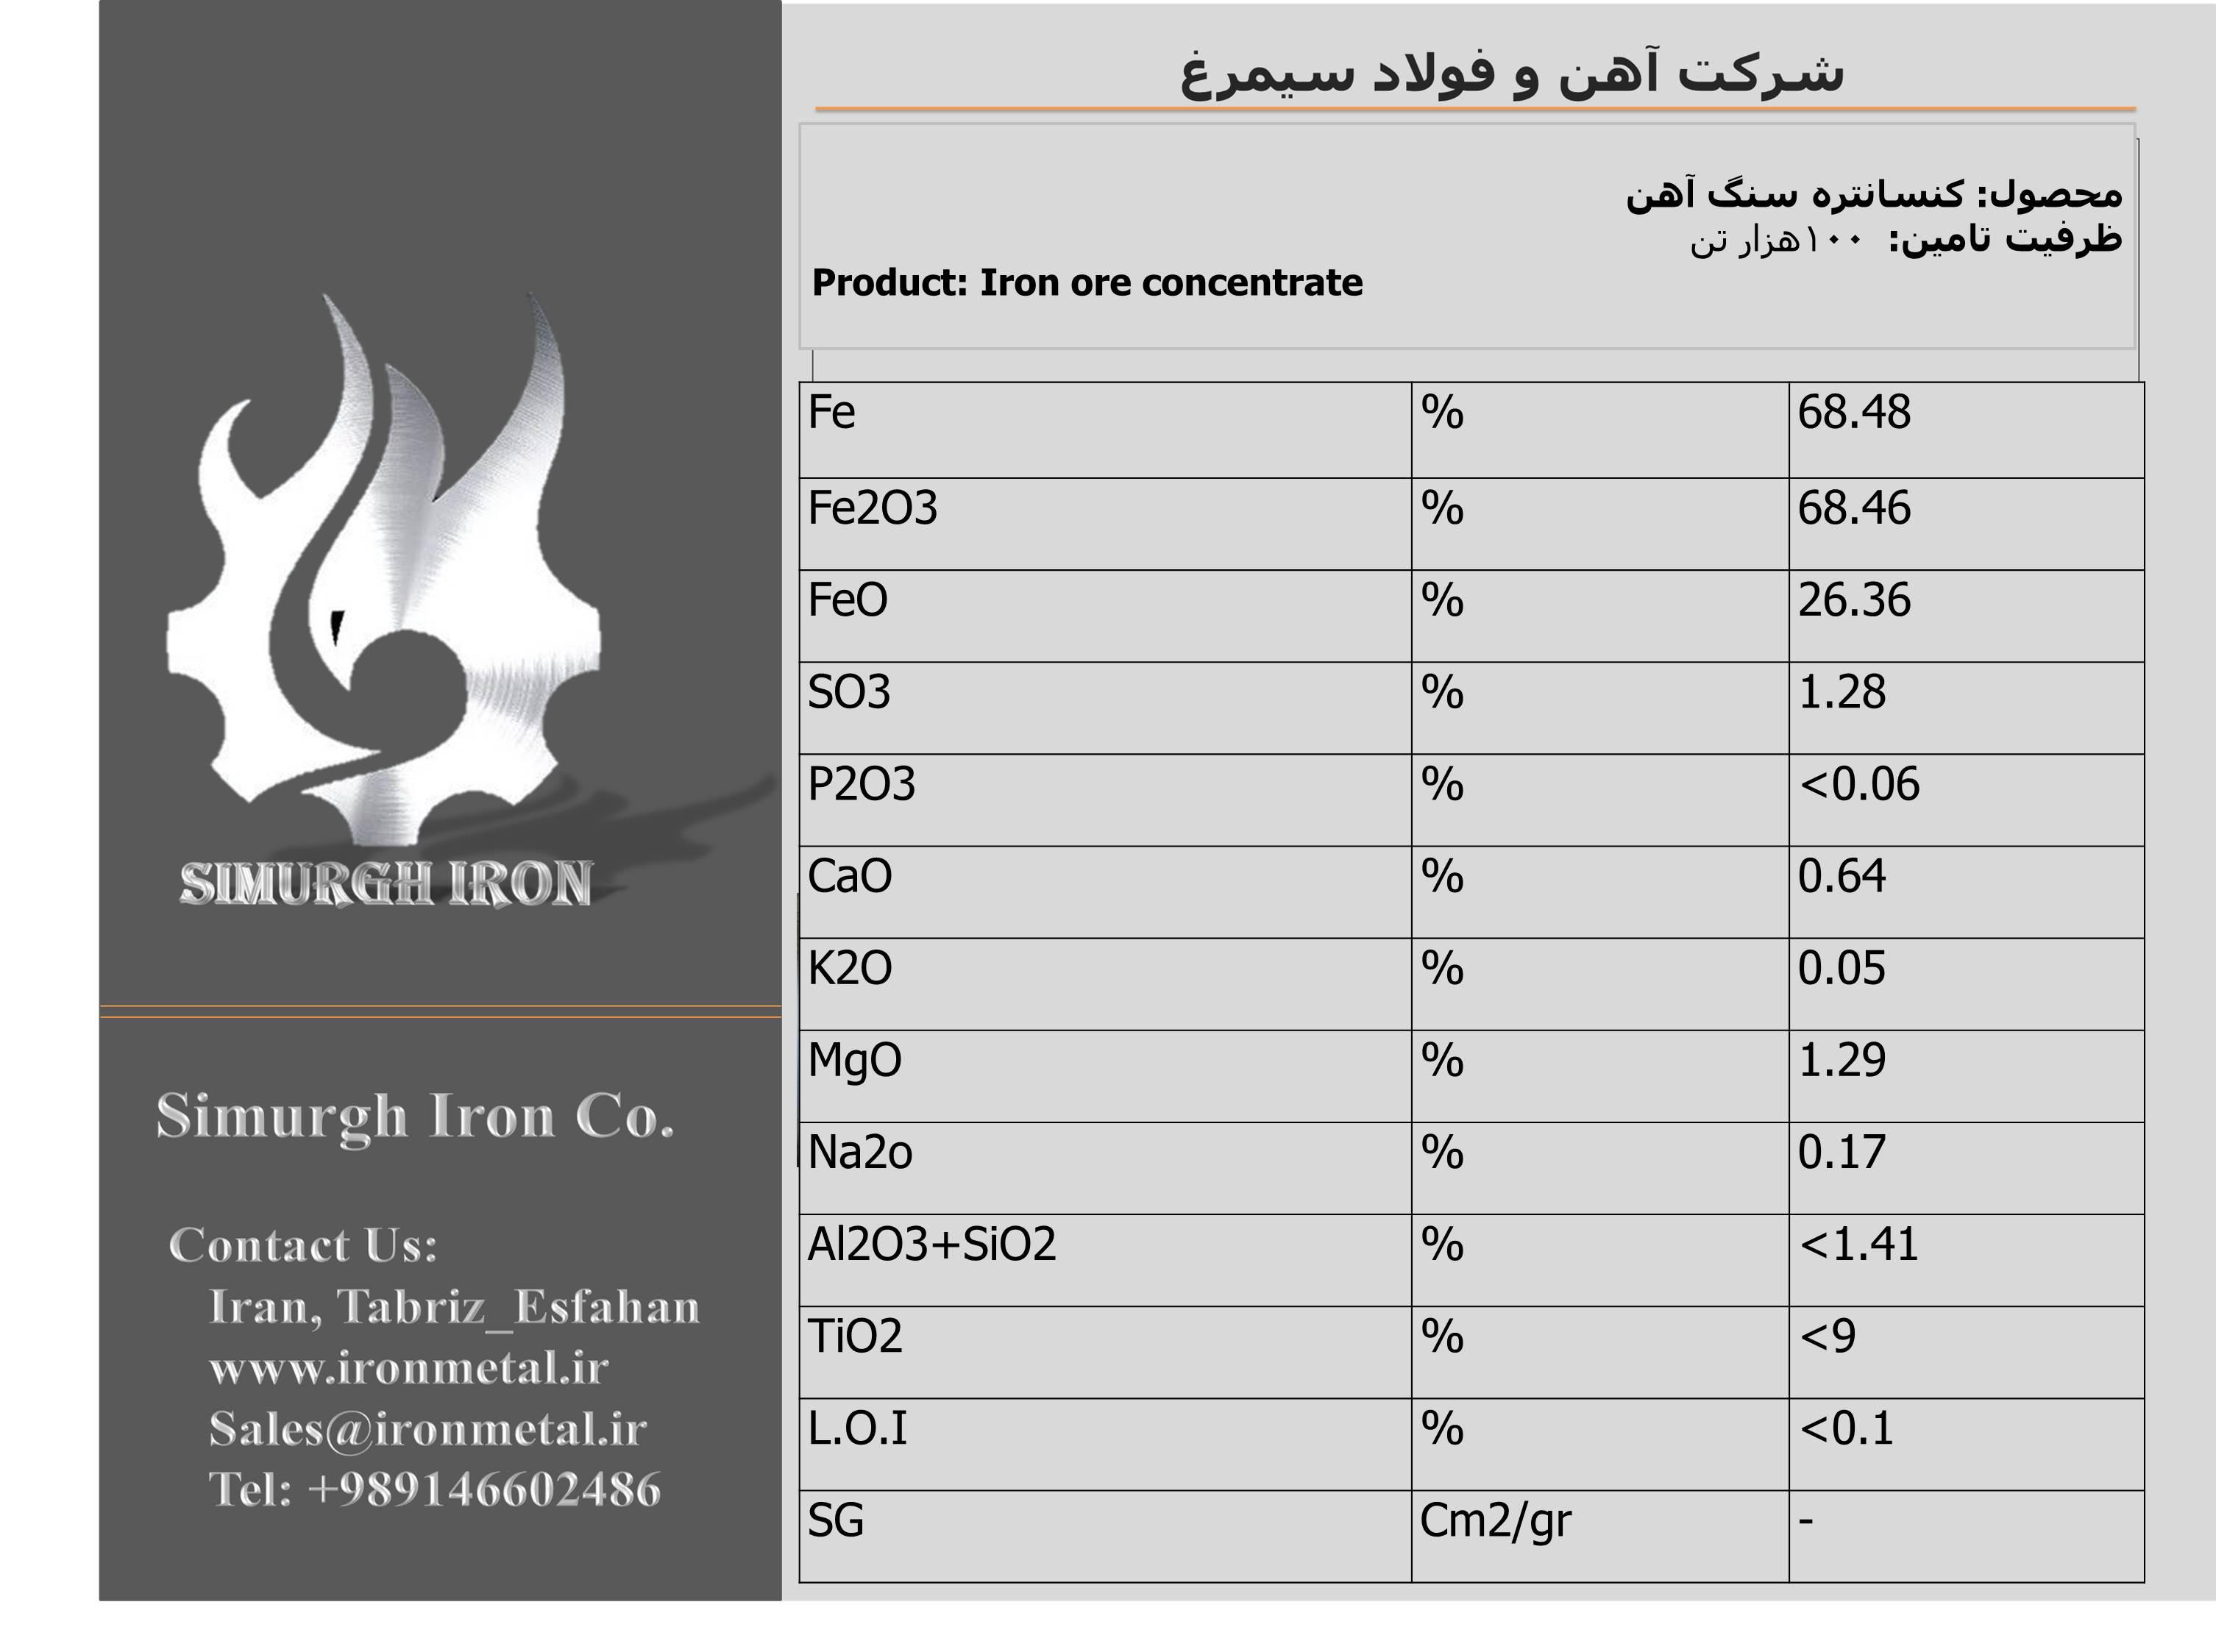 قیمت هر تن کنسانتره سنگ آهن چادرملو